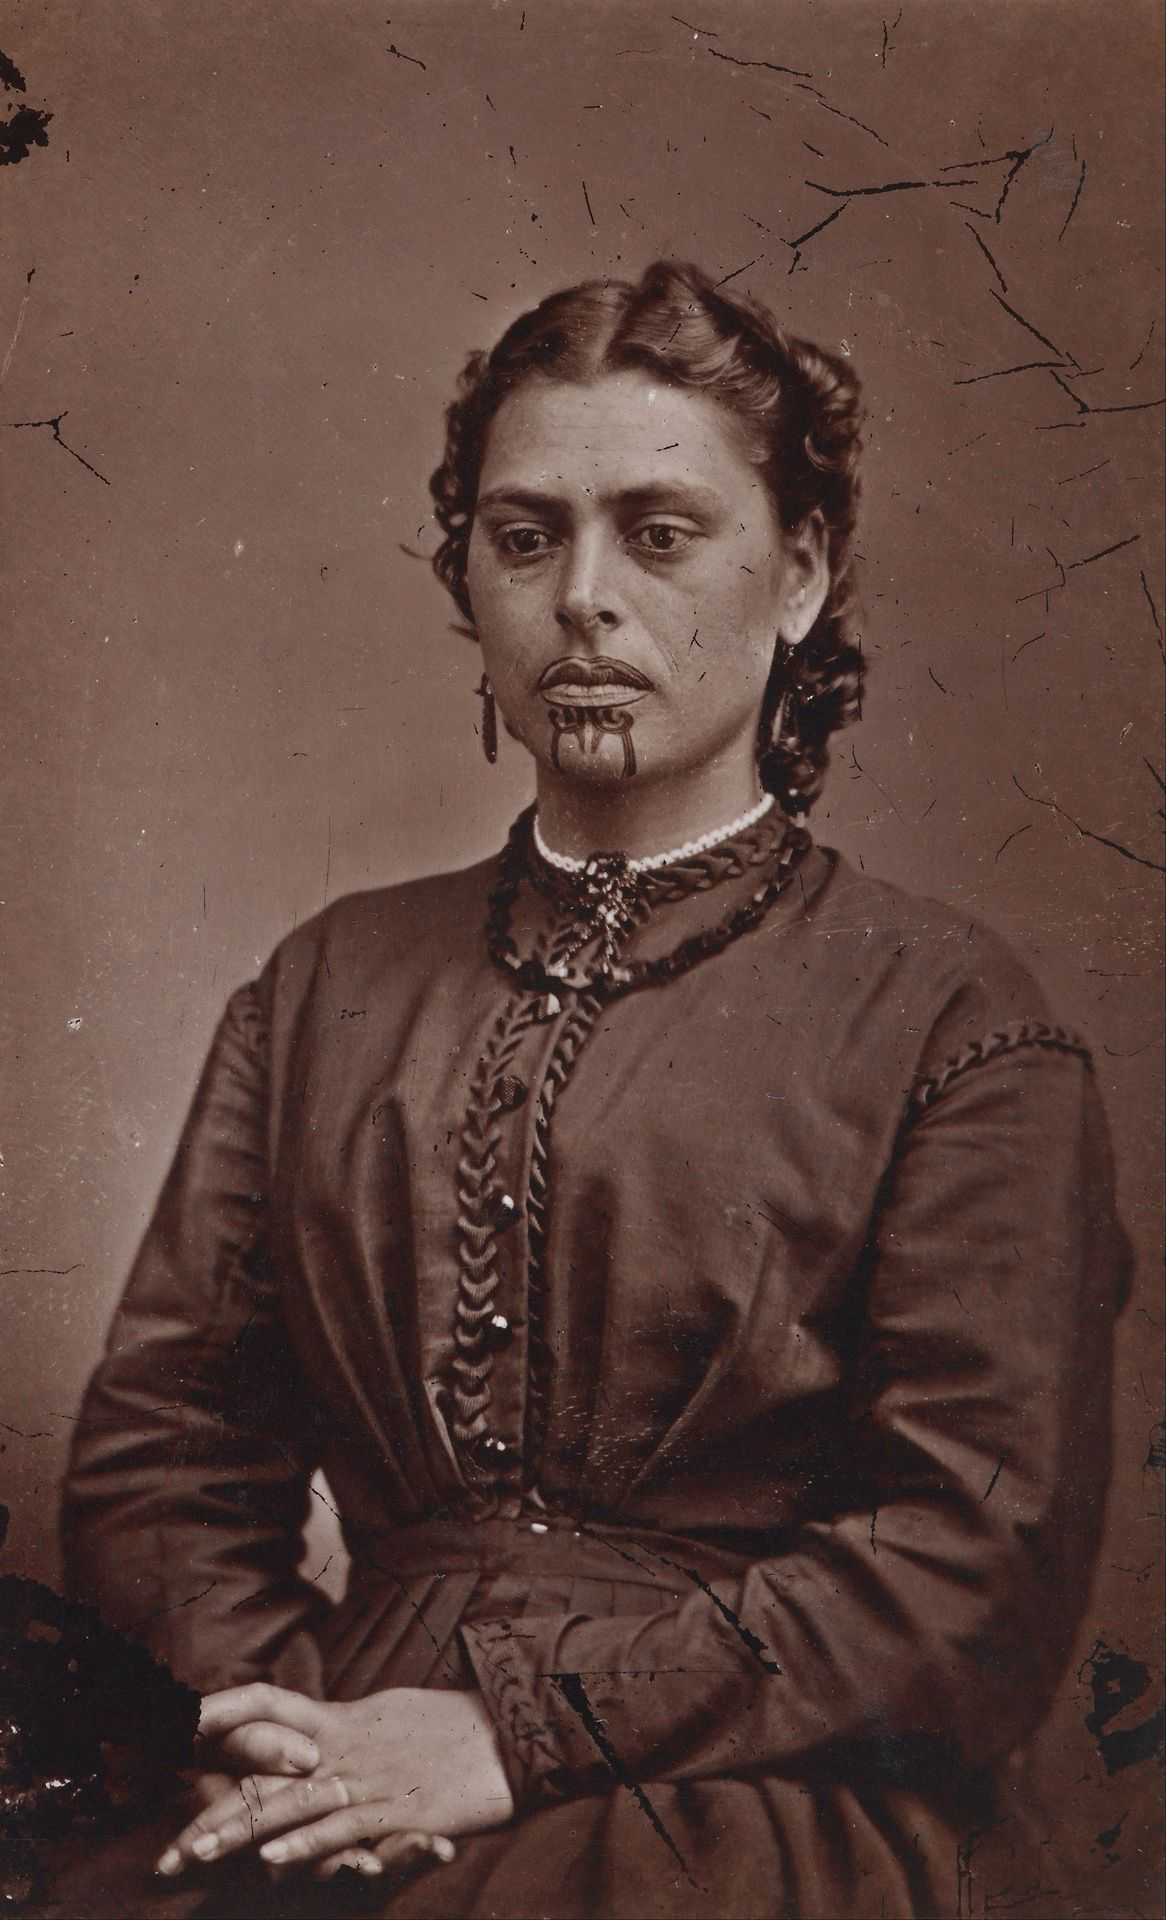 Maori Face Tattoo Designs Women: Mrs Rabone, 1871. American Photographic Company (Auckland